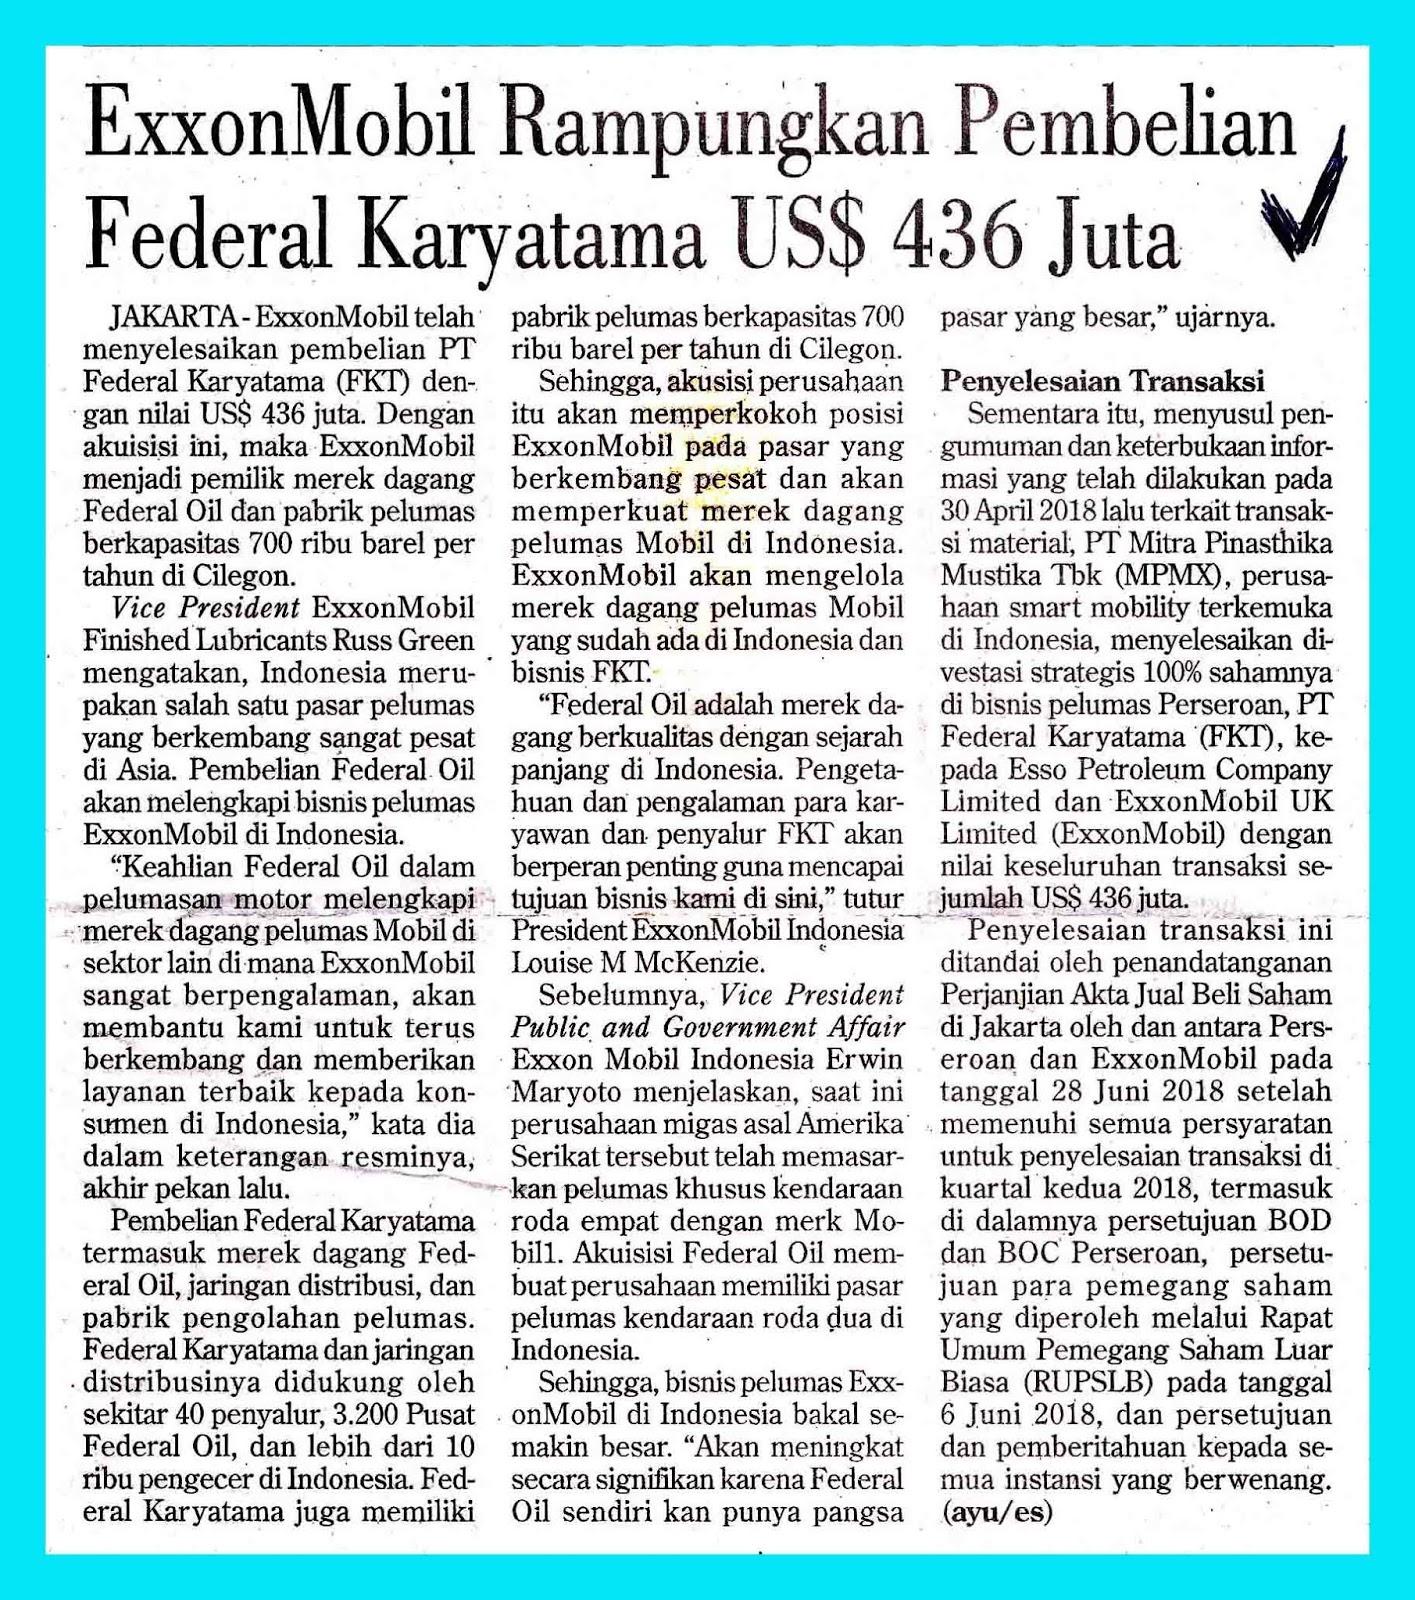 ExxonMobil Completes Purchase of Federal Karyatama US $ 436